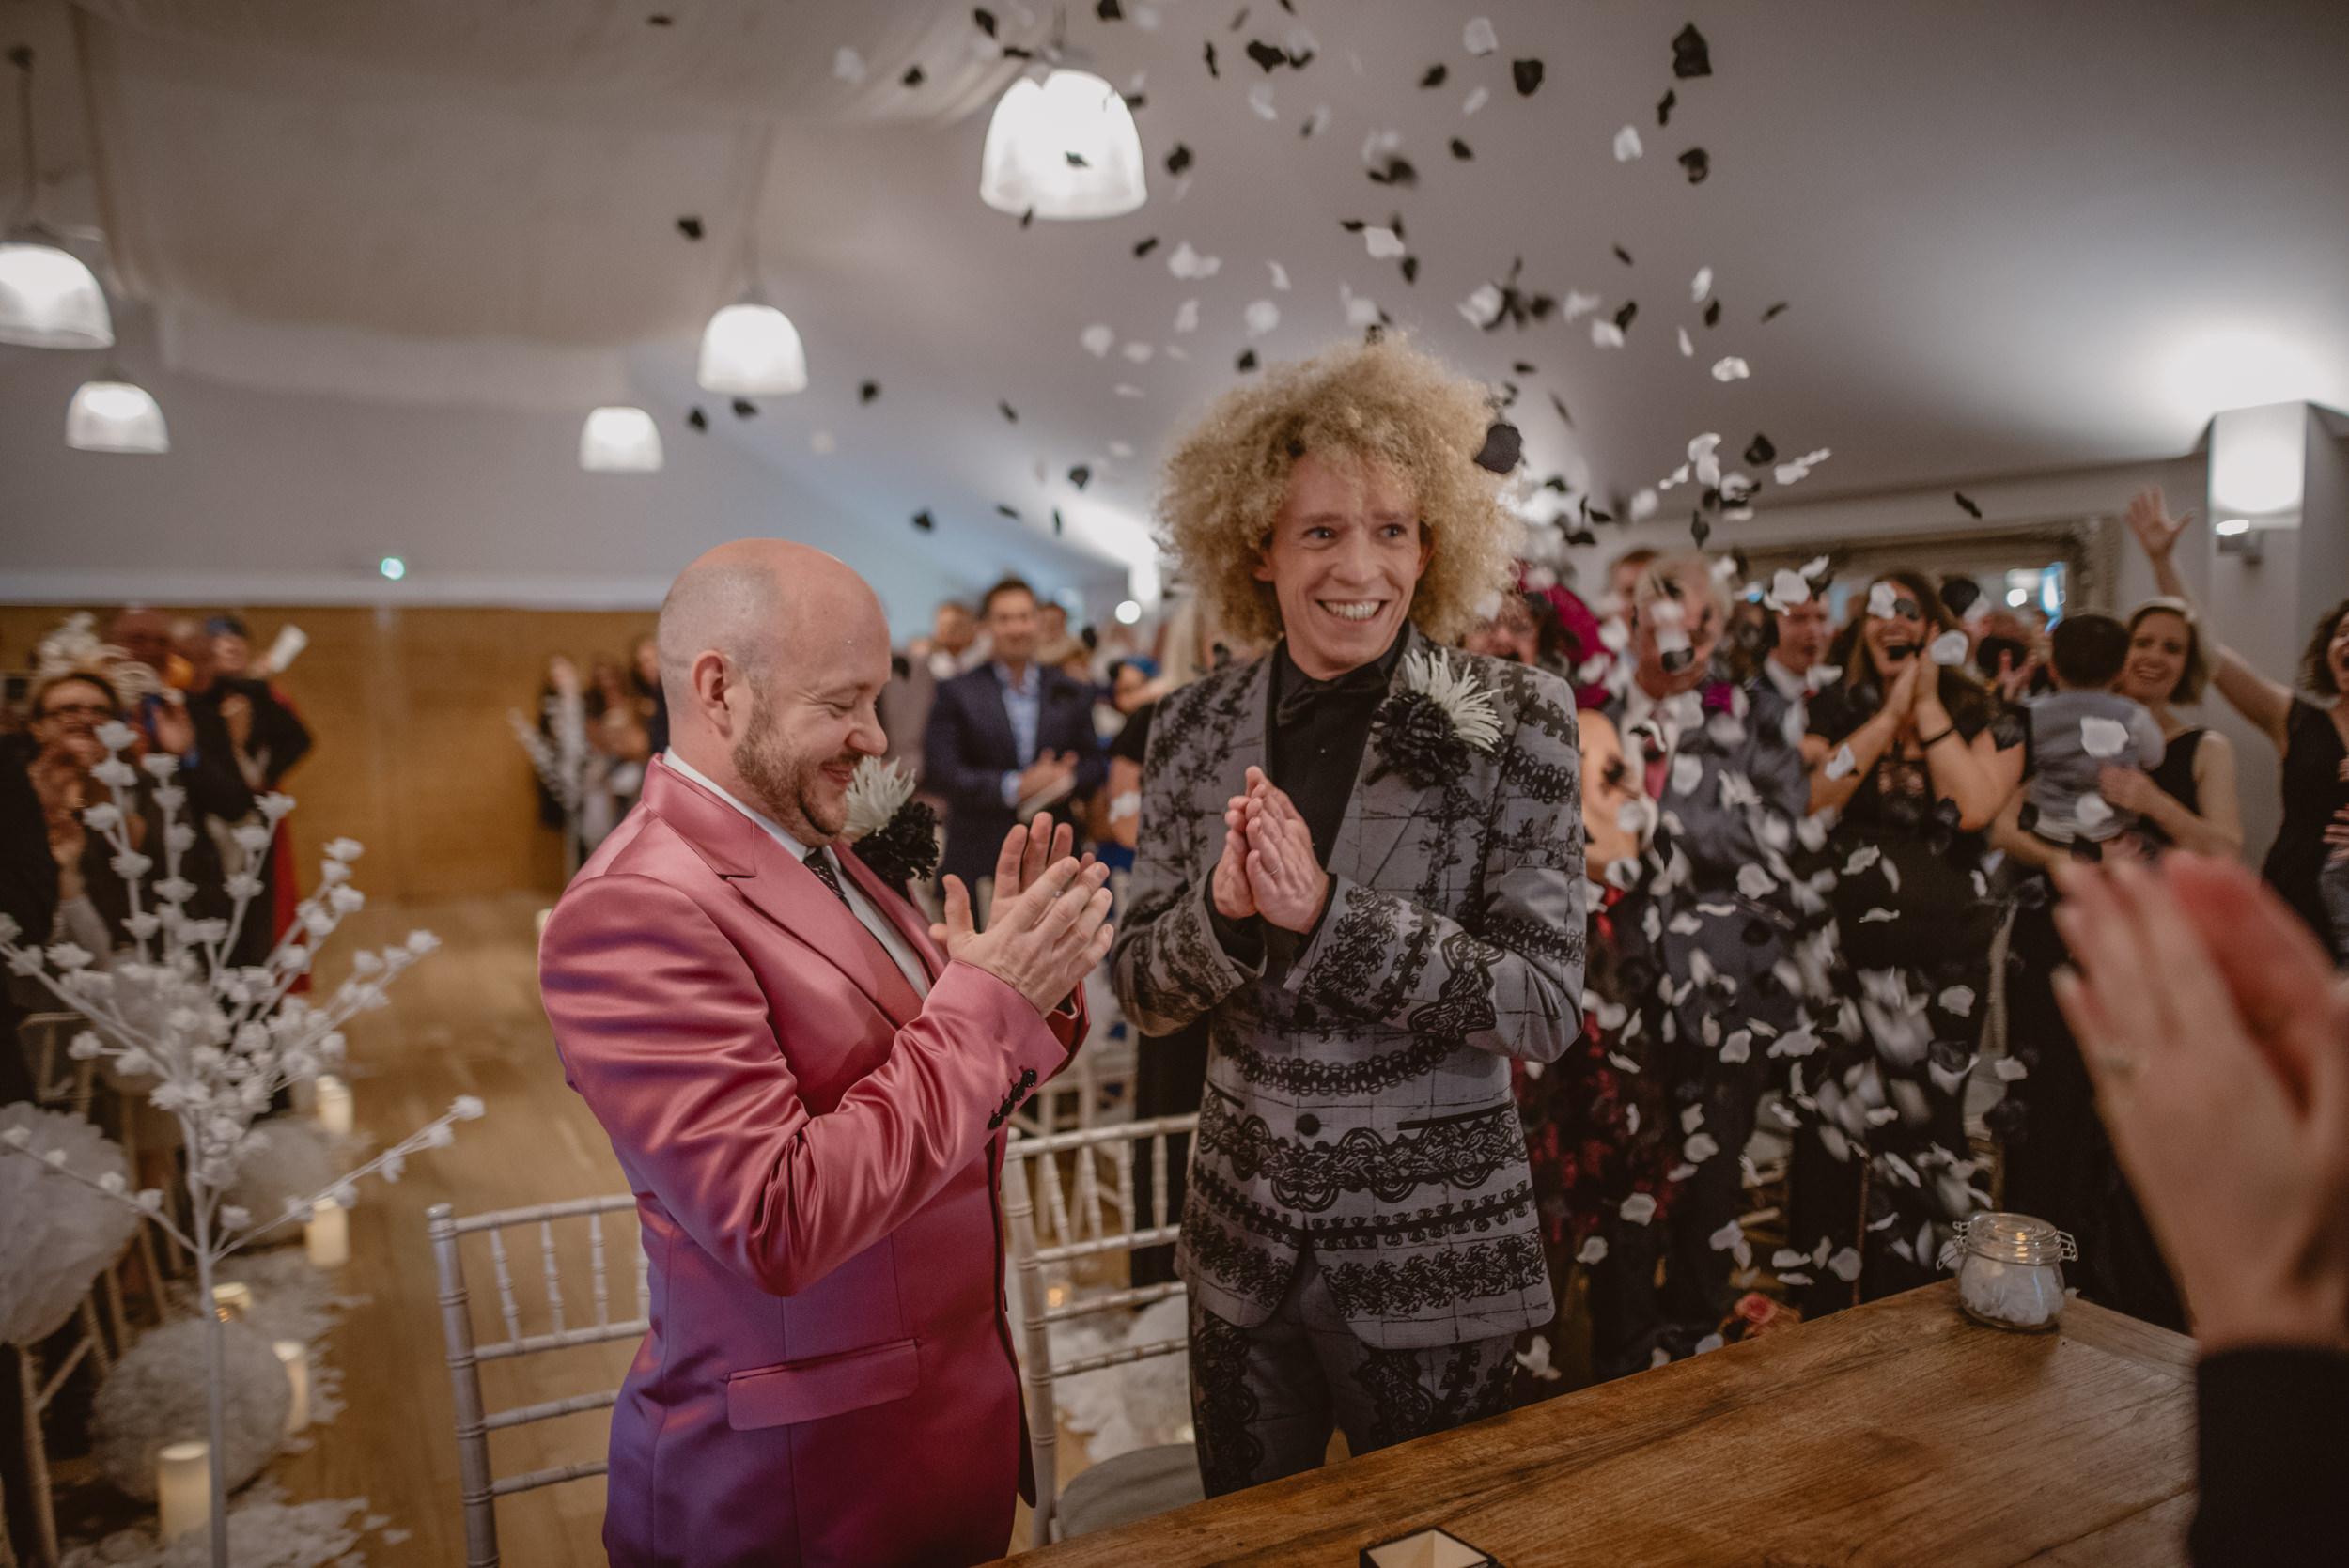 Barry-and-Chaz-wedding-Wasing-Park-Berkshire-Manu-Mendoza-Wedding-Photography-199.jpg